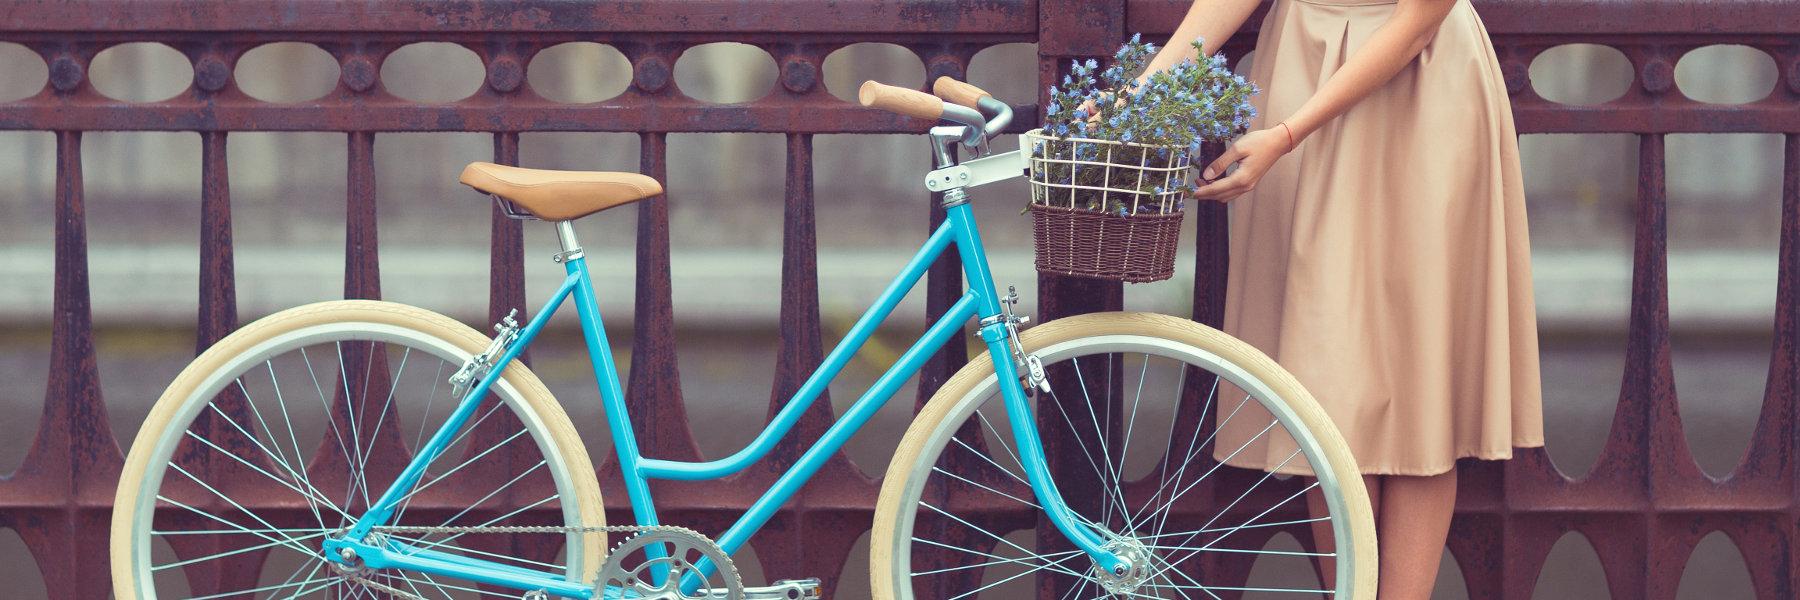 rowerowa wiosna